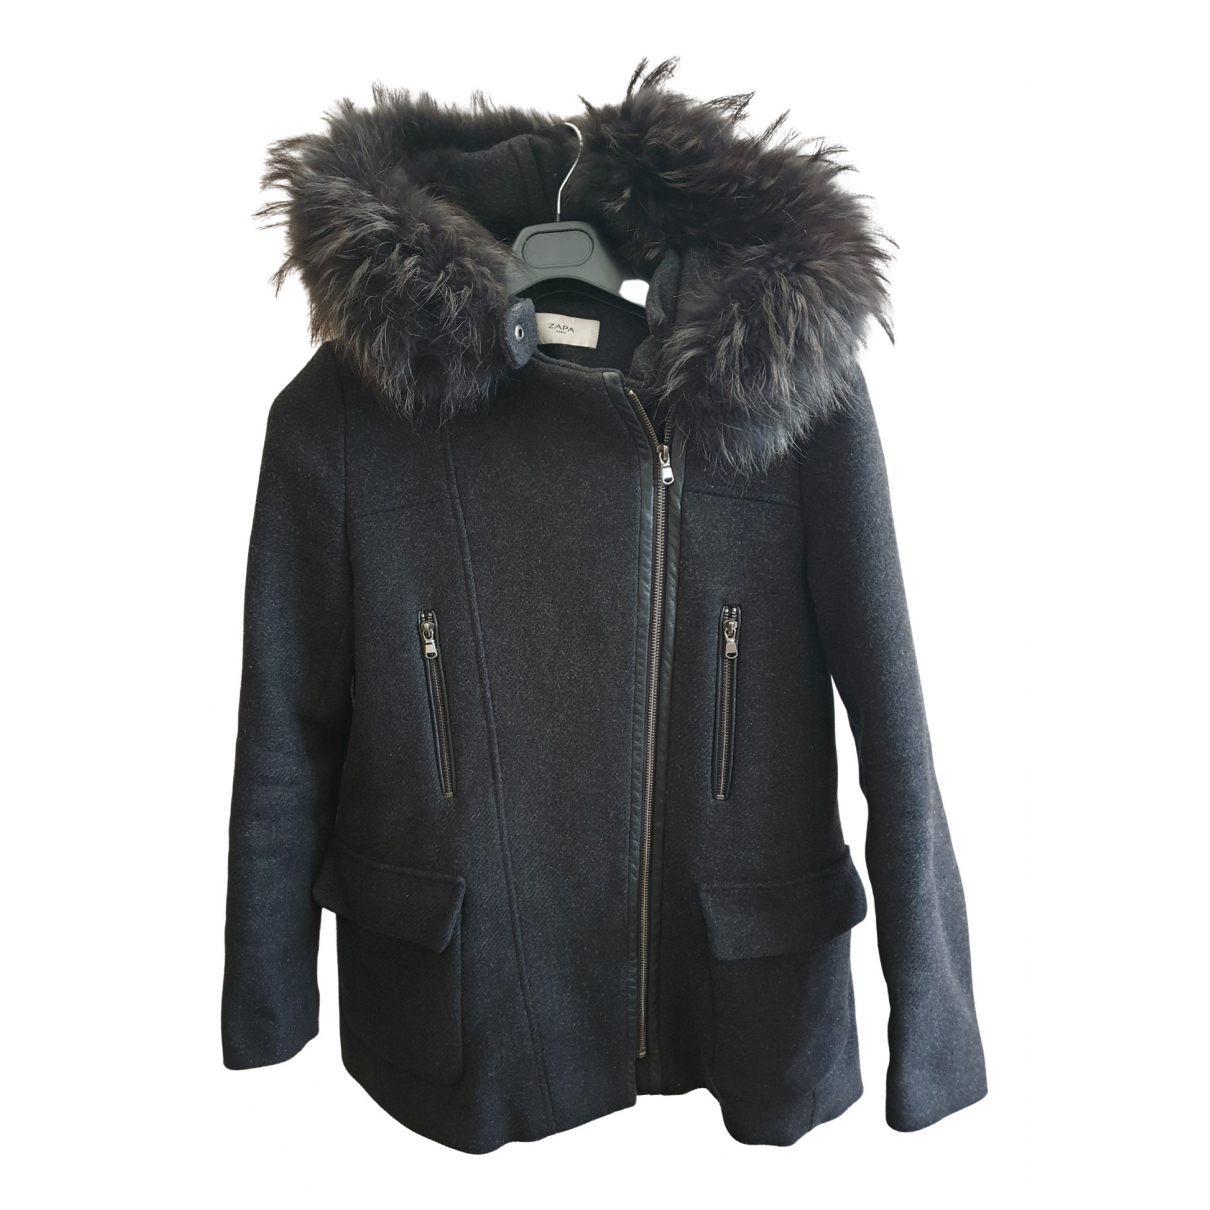 Zapa \N Anthracite Wool coat for Women 36 FR